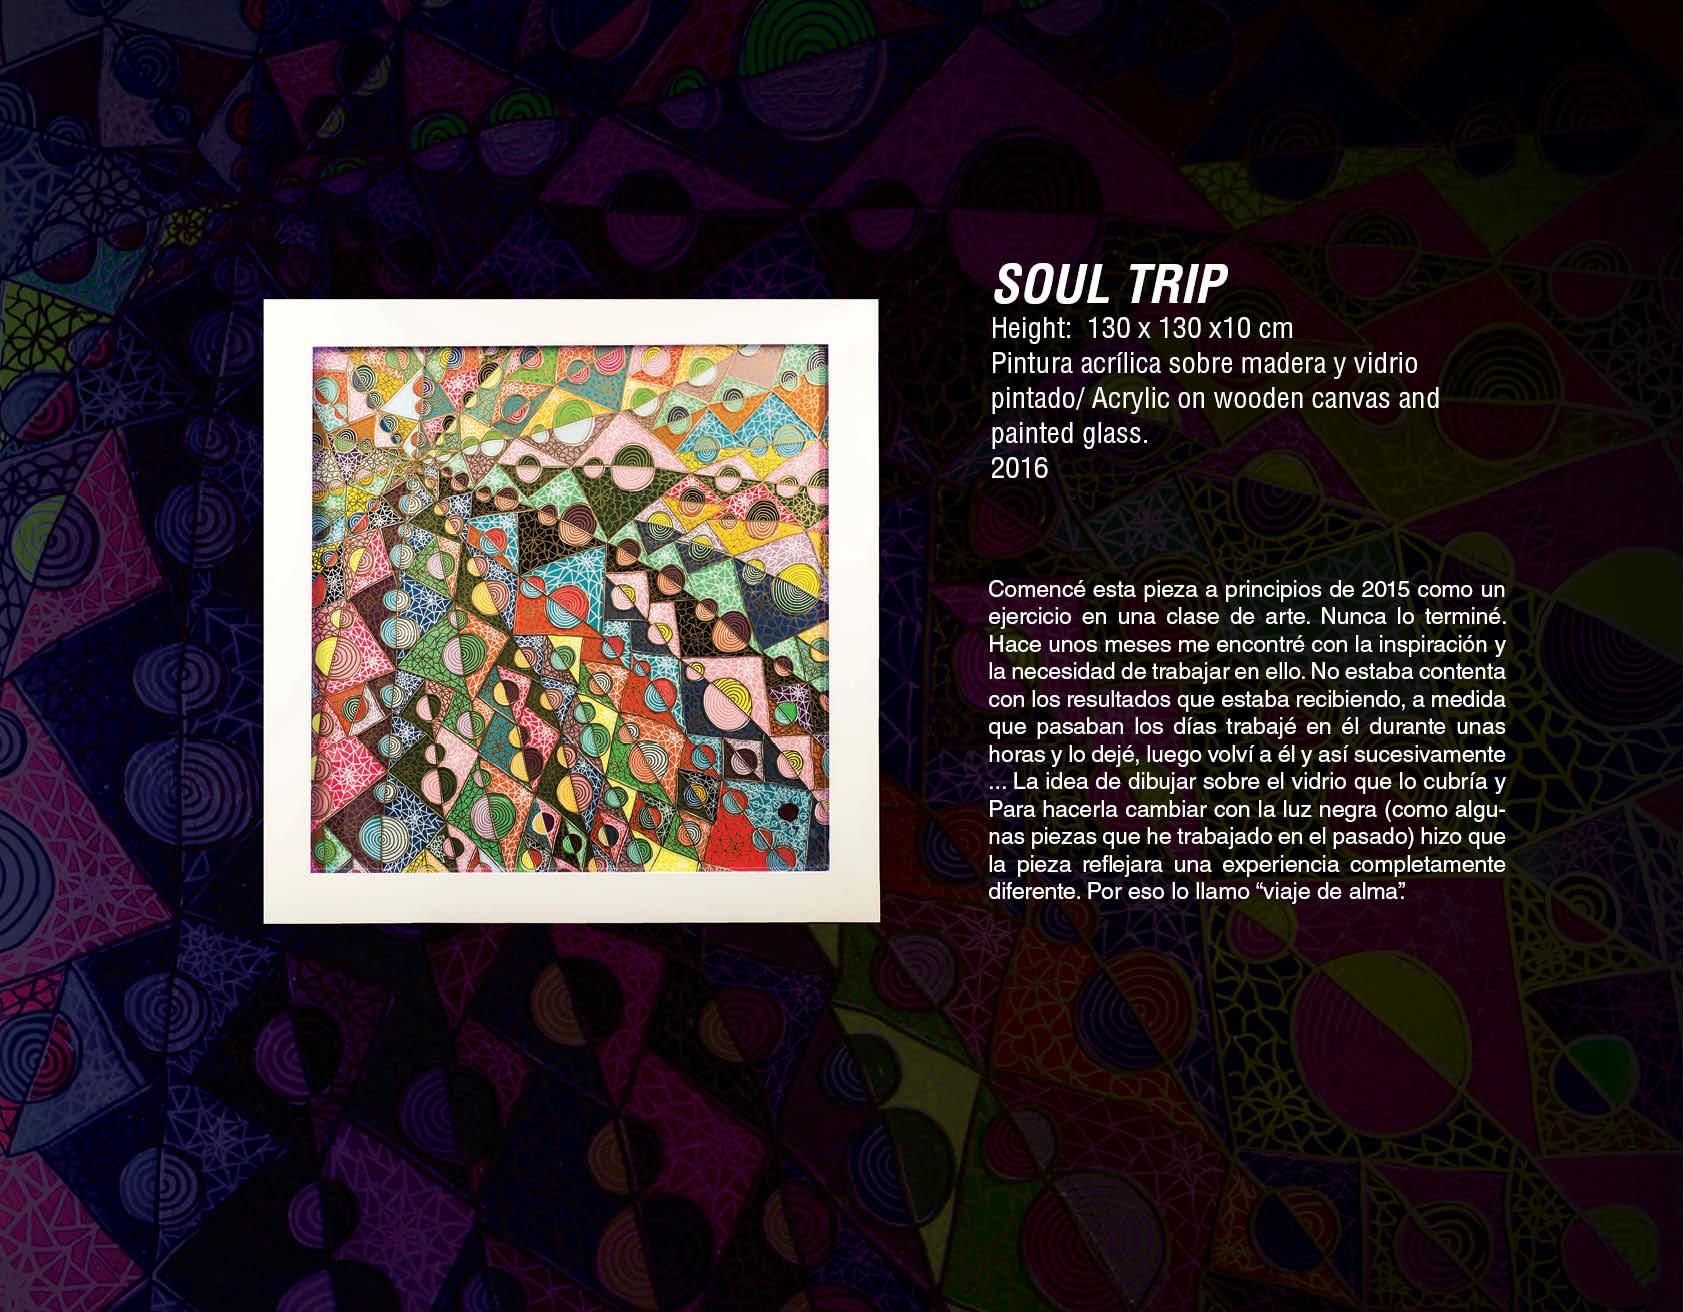 Soul trip 1.jpg